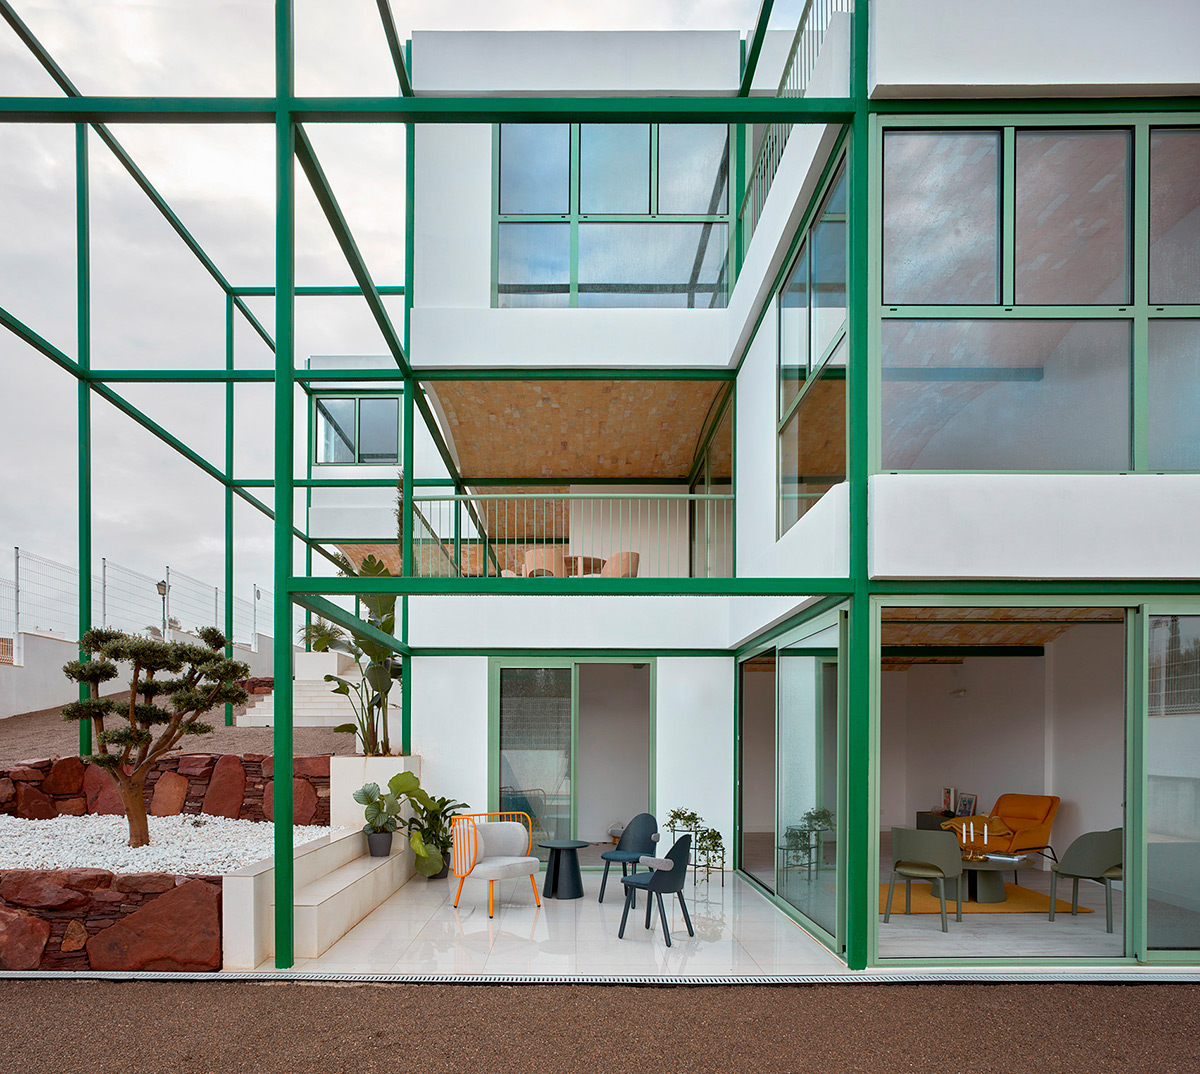 Brick-Vault-House-Space-Popular-Mariela-Apollonio-06